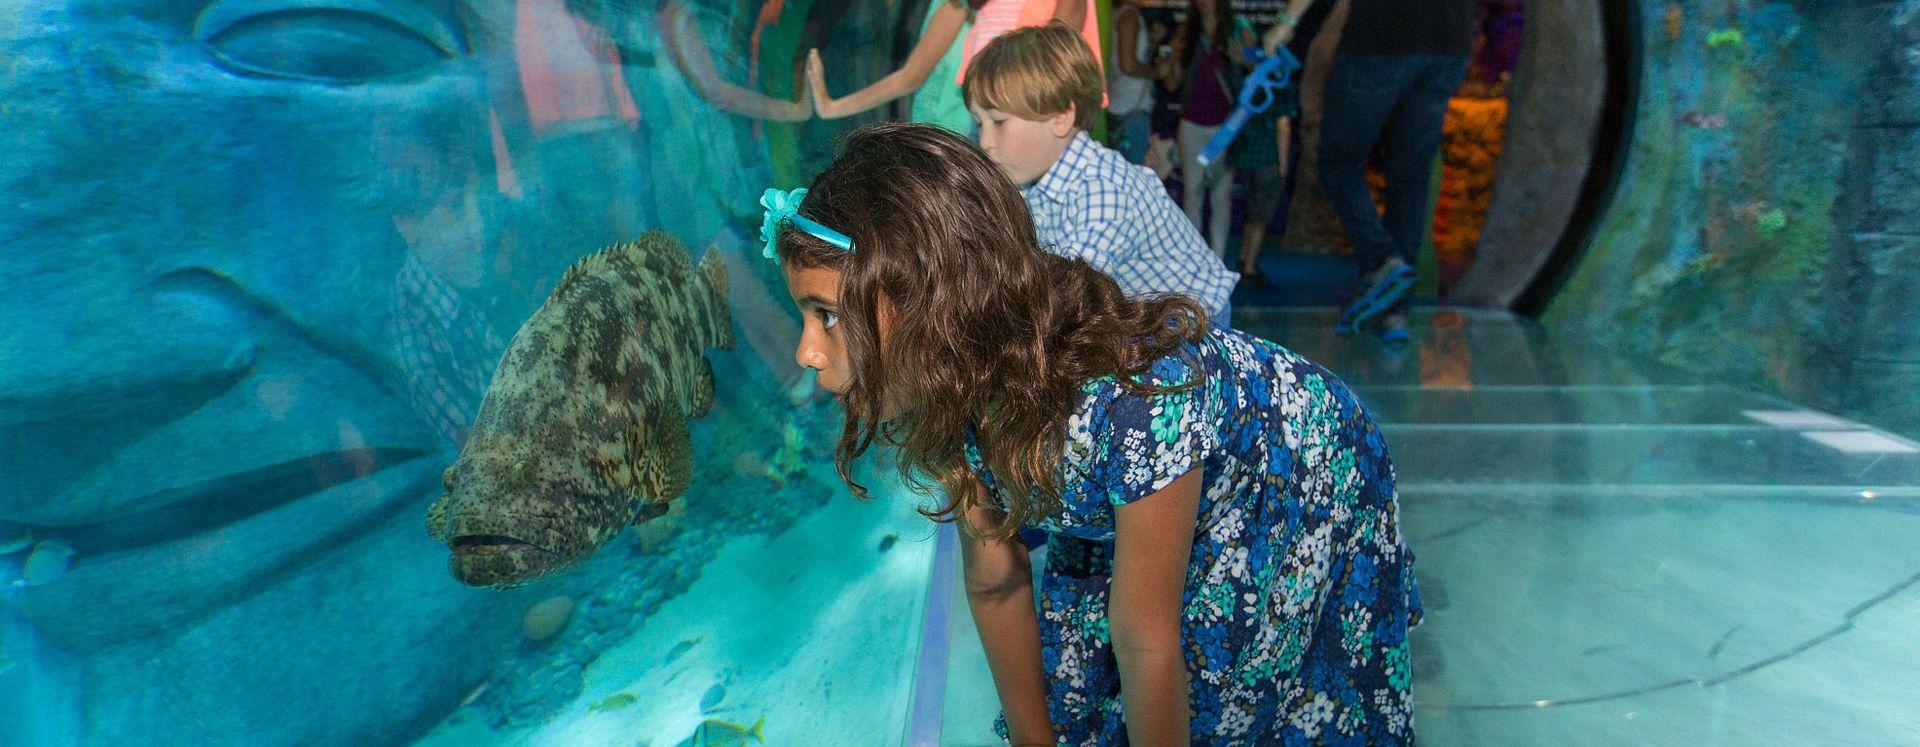 girl kneeling in the tunnel of SEA LIFE Orlando Aquarium